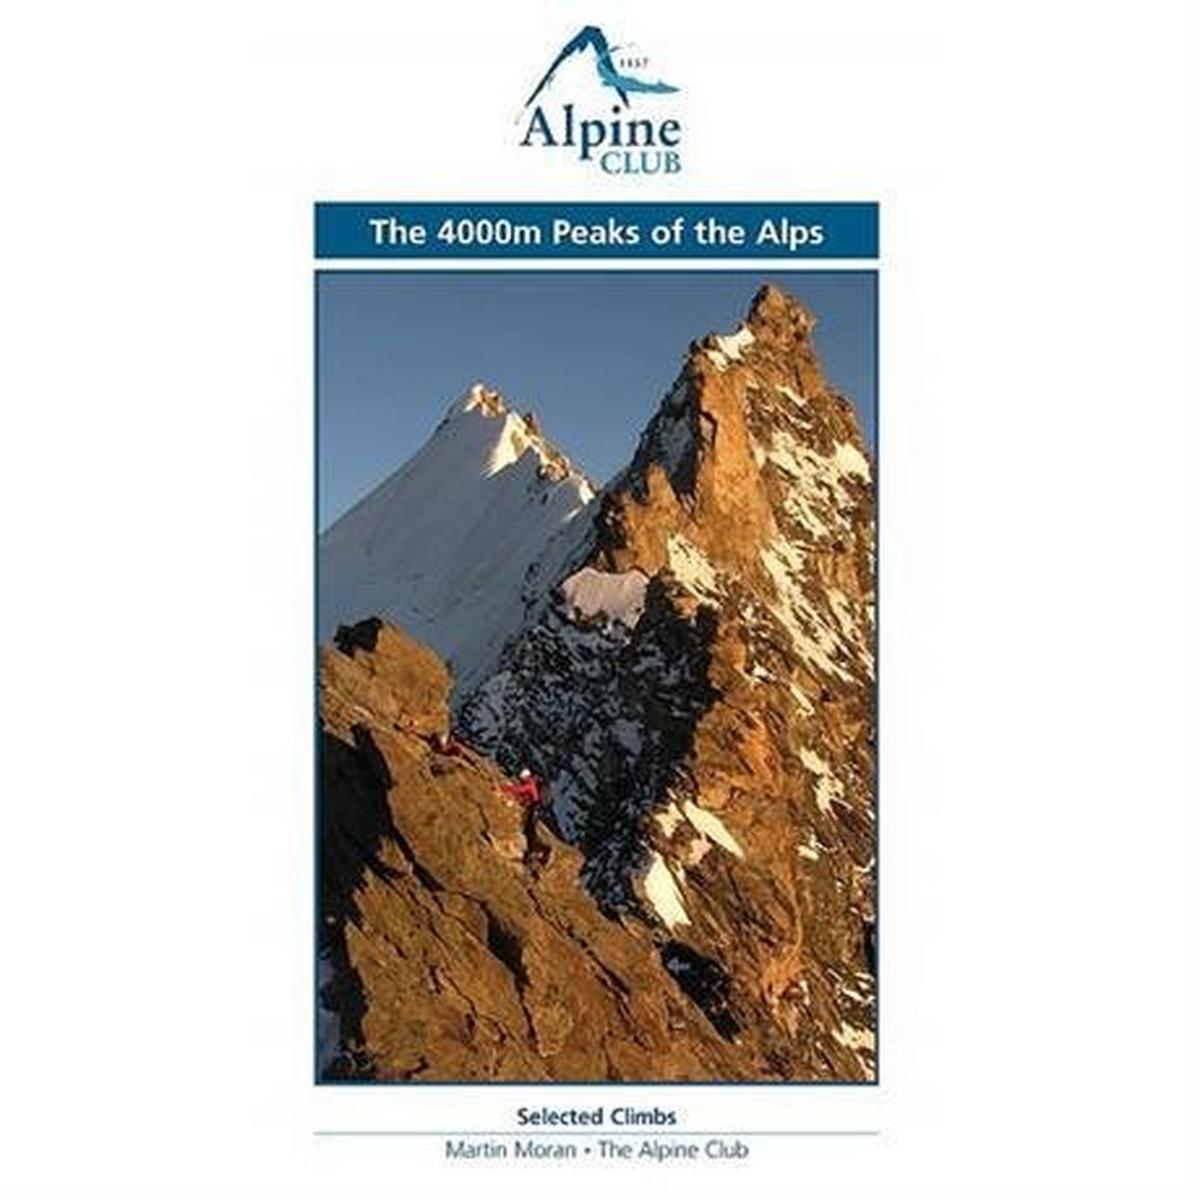 Alpine Club The Alpine Club Climbing Guide Book: 4000m Peaks of the Alps: Moran